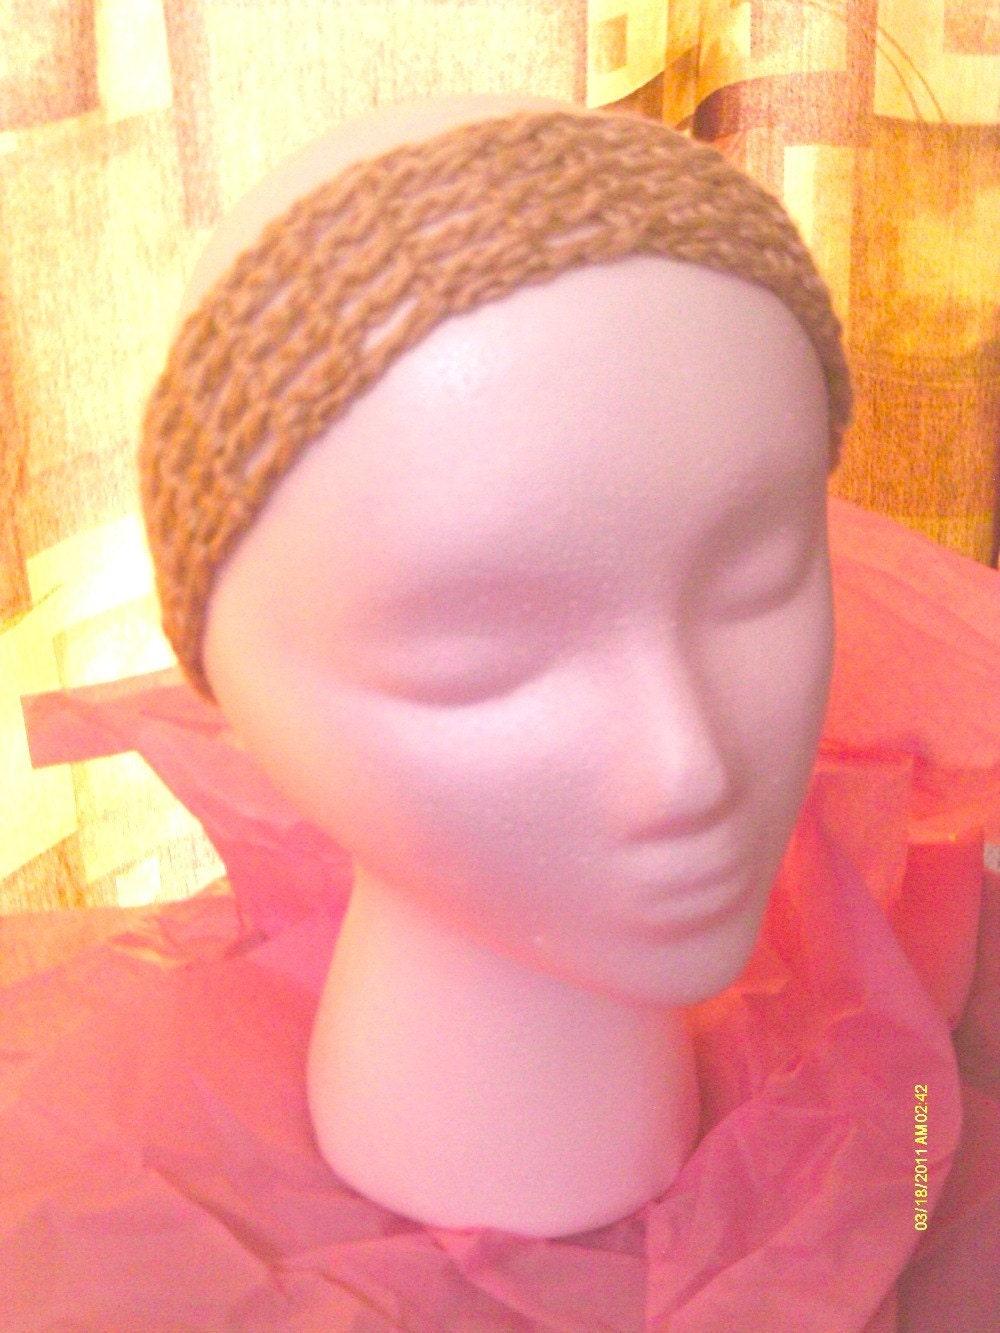 Buy ONE Get ONE Free SALE - Wide Hand Crochet Dreadband / Headband - Tan